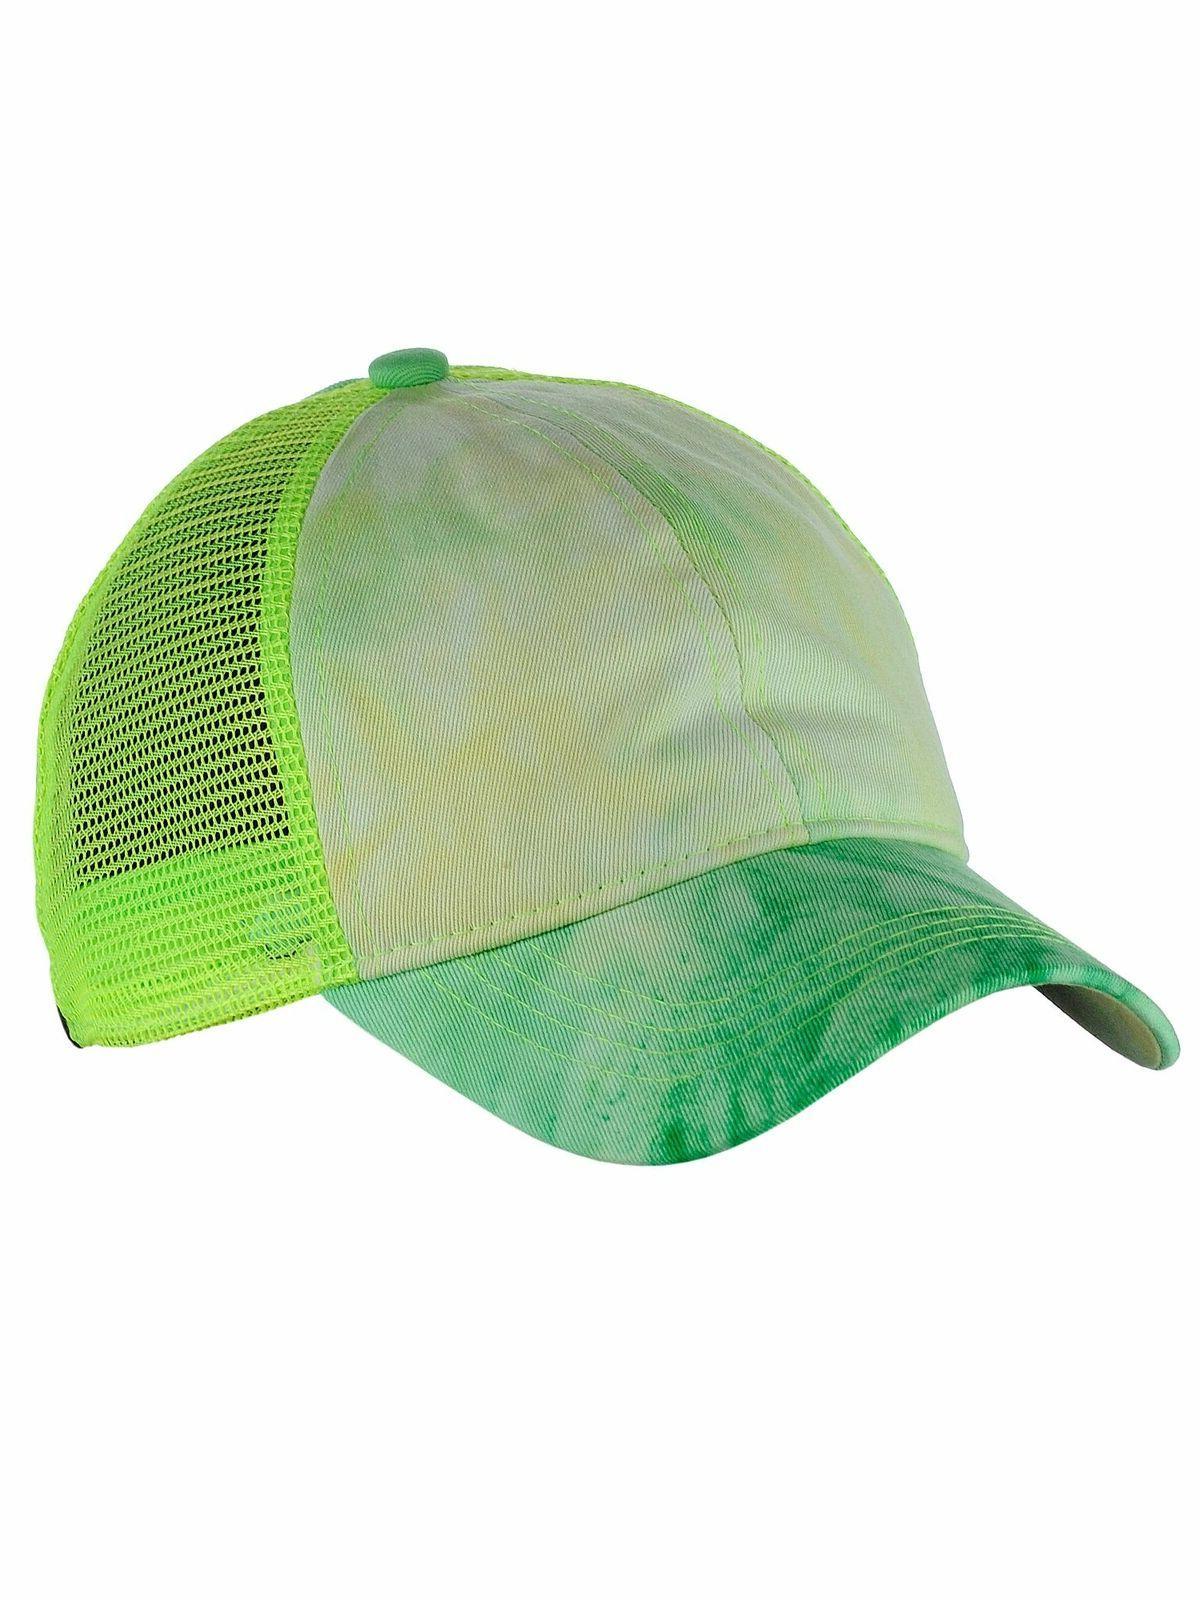 C.C Ponycap Bun Ponytail Dye Cap Hat